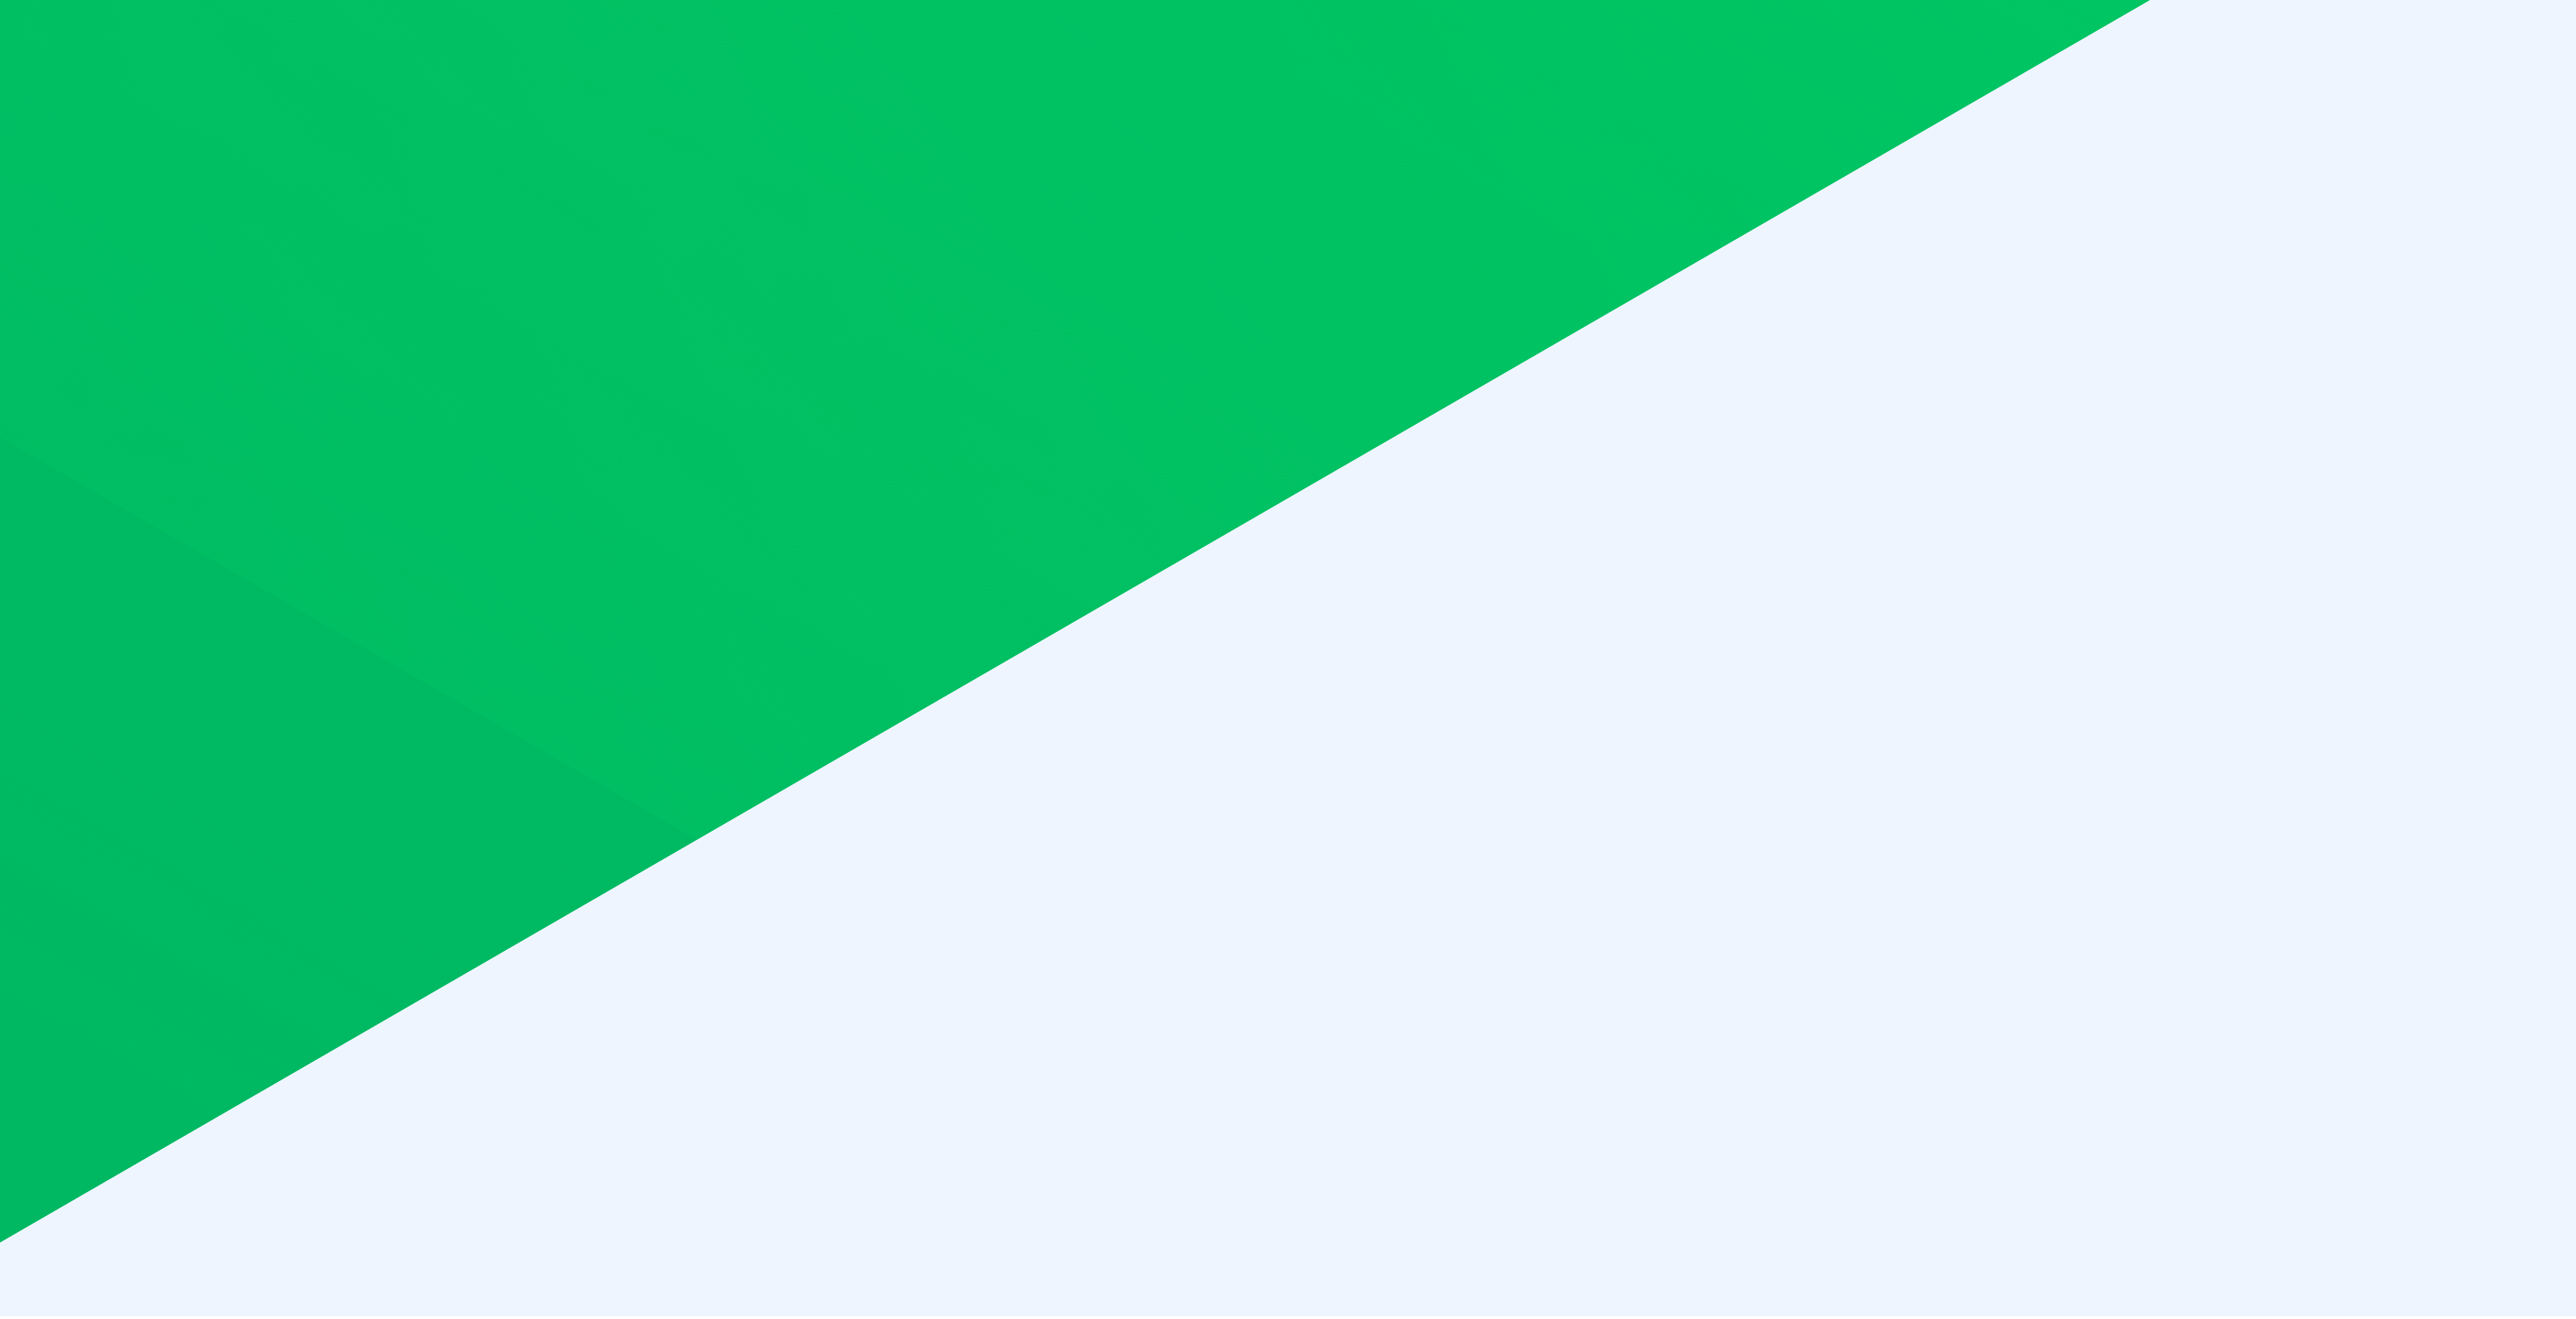 kinvey-resources-bg